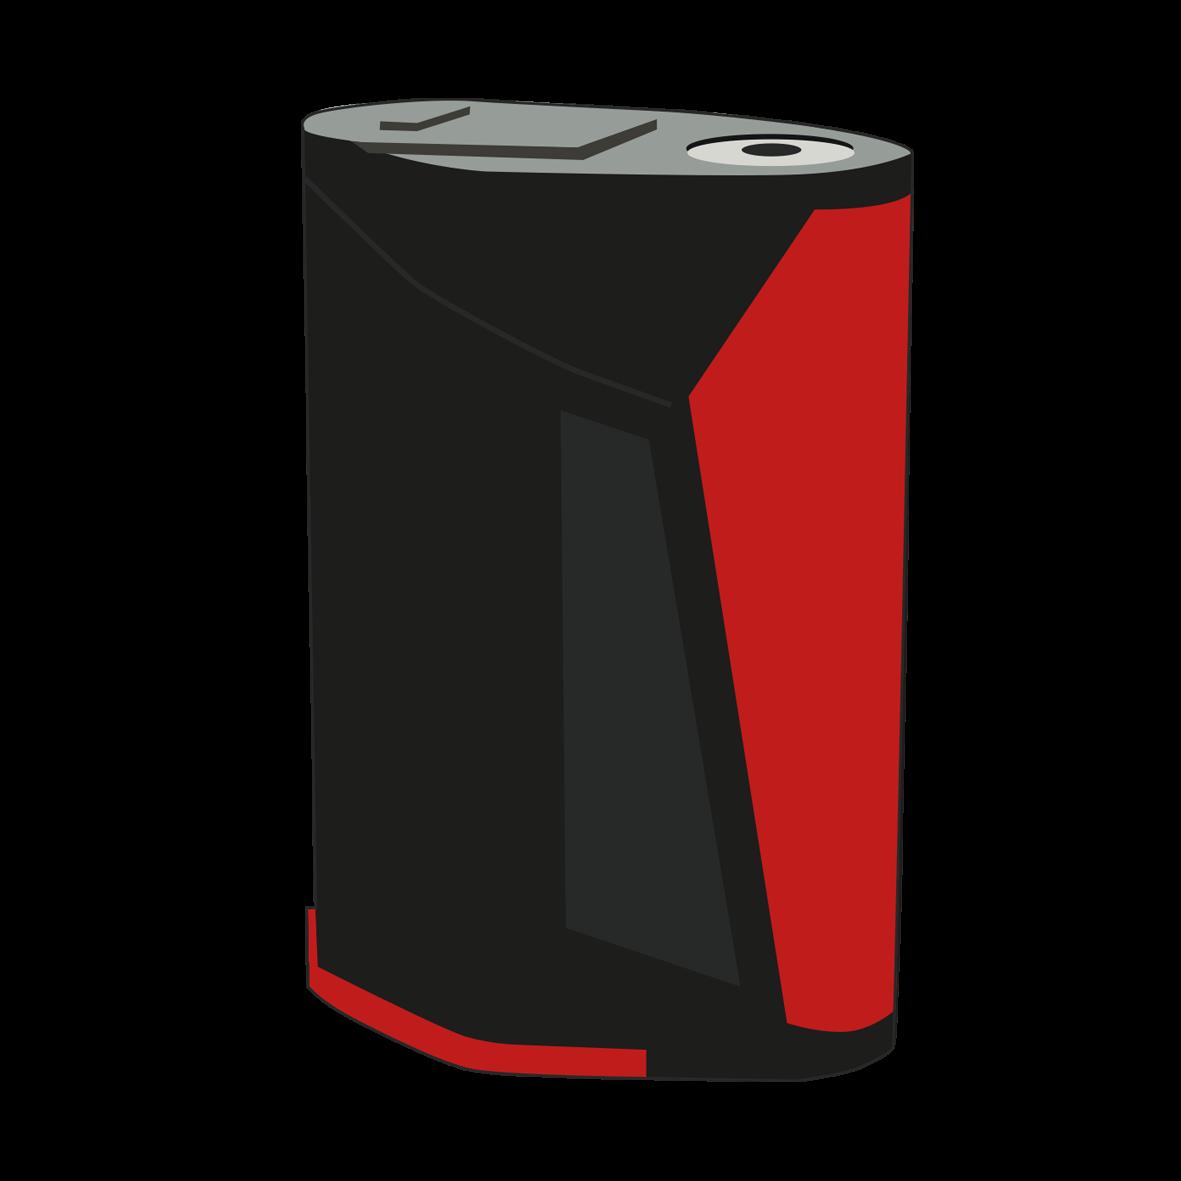 Mod 4 battery